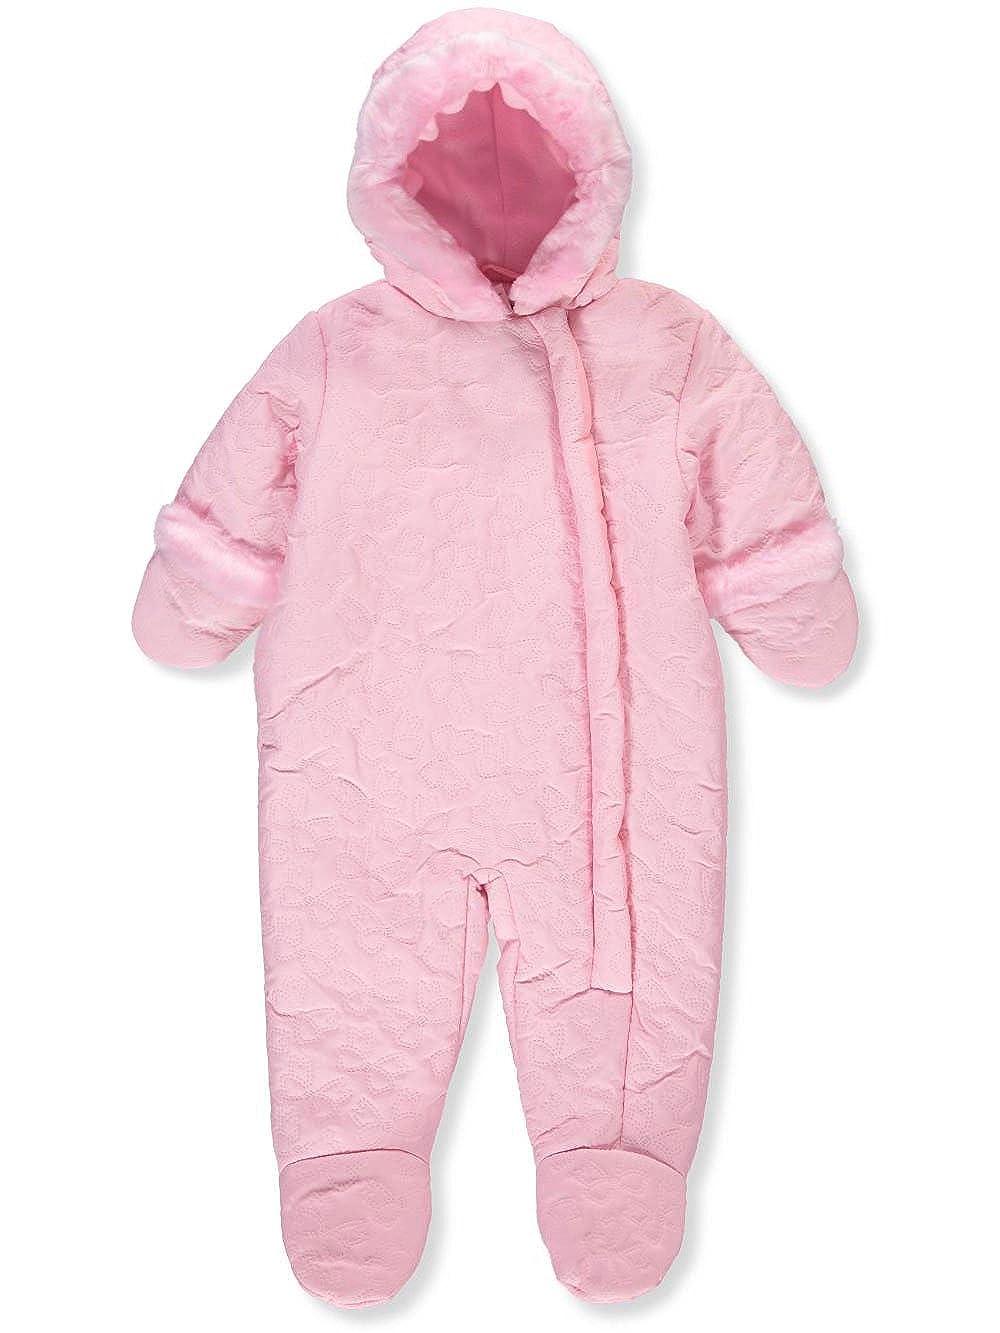 3aaa9f1c8 Amazon.com  Rothschild Baby Girls  Insulated Pram Suit - Petal Pink ...